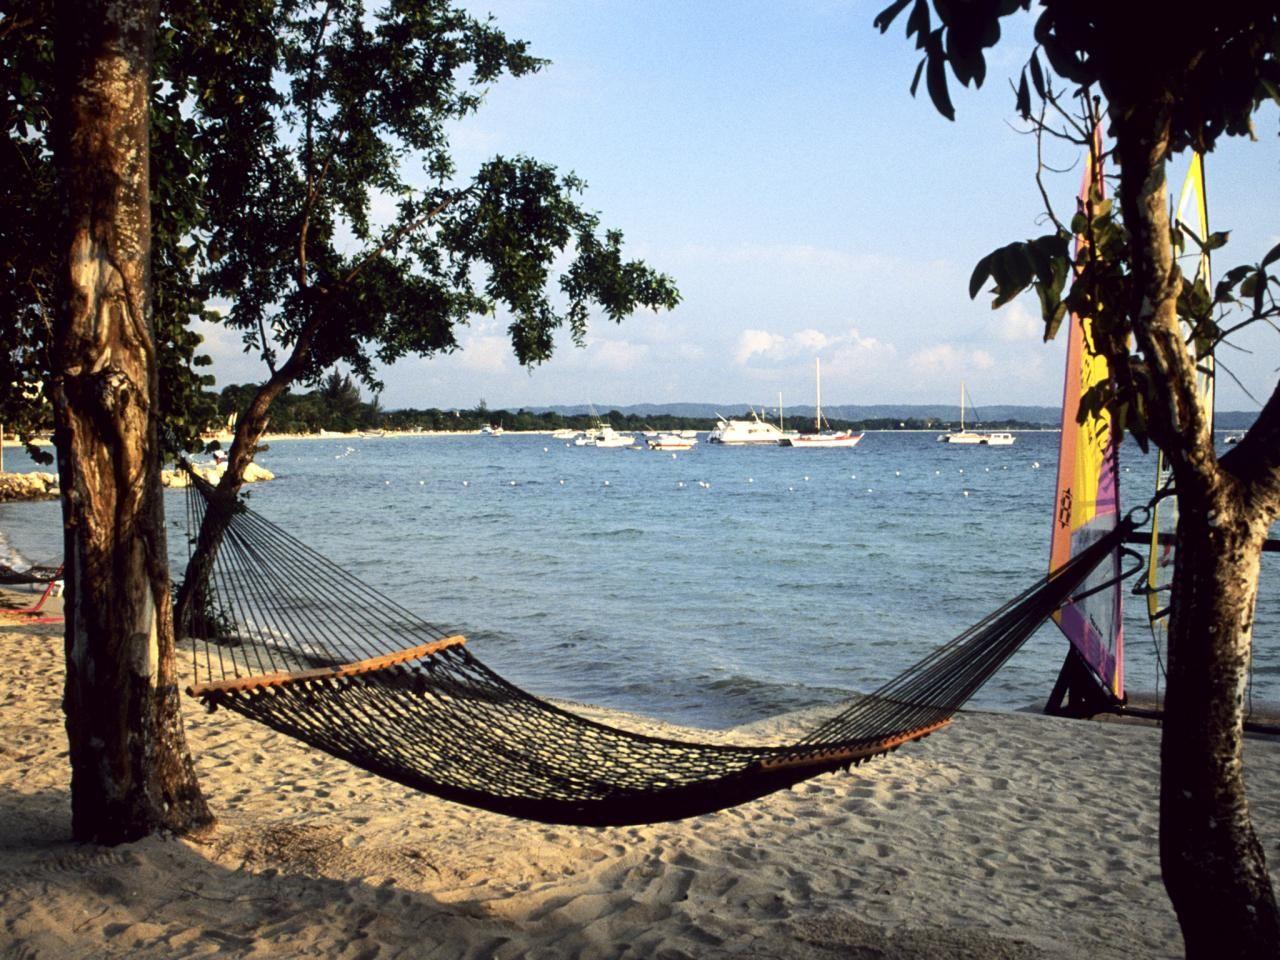 Beaches Sandy Bay All Inclusive Caribbean Beach Resorts Travelchannel Com Caribbean Resort Caribbean Beach Resort Caribbean Beaches